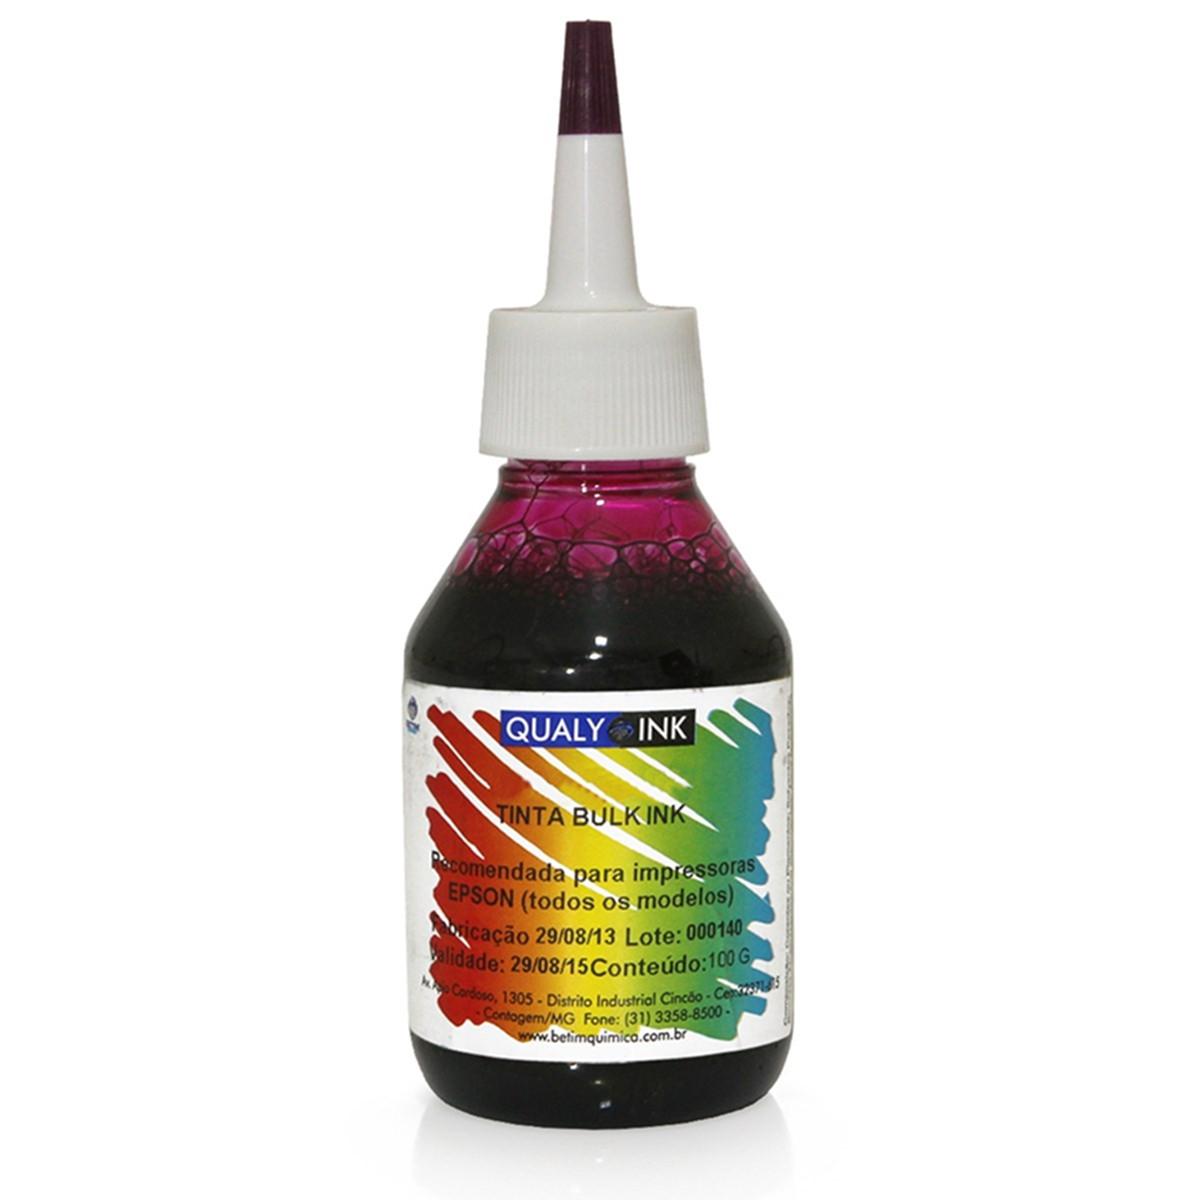 Tinta Epson T673320 Magenta Corante   L800 L810 L805 L1800   Com Bico Aplicador   Qualy ink 100g